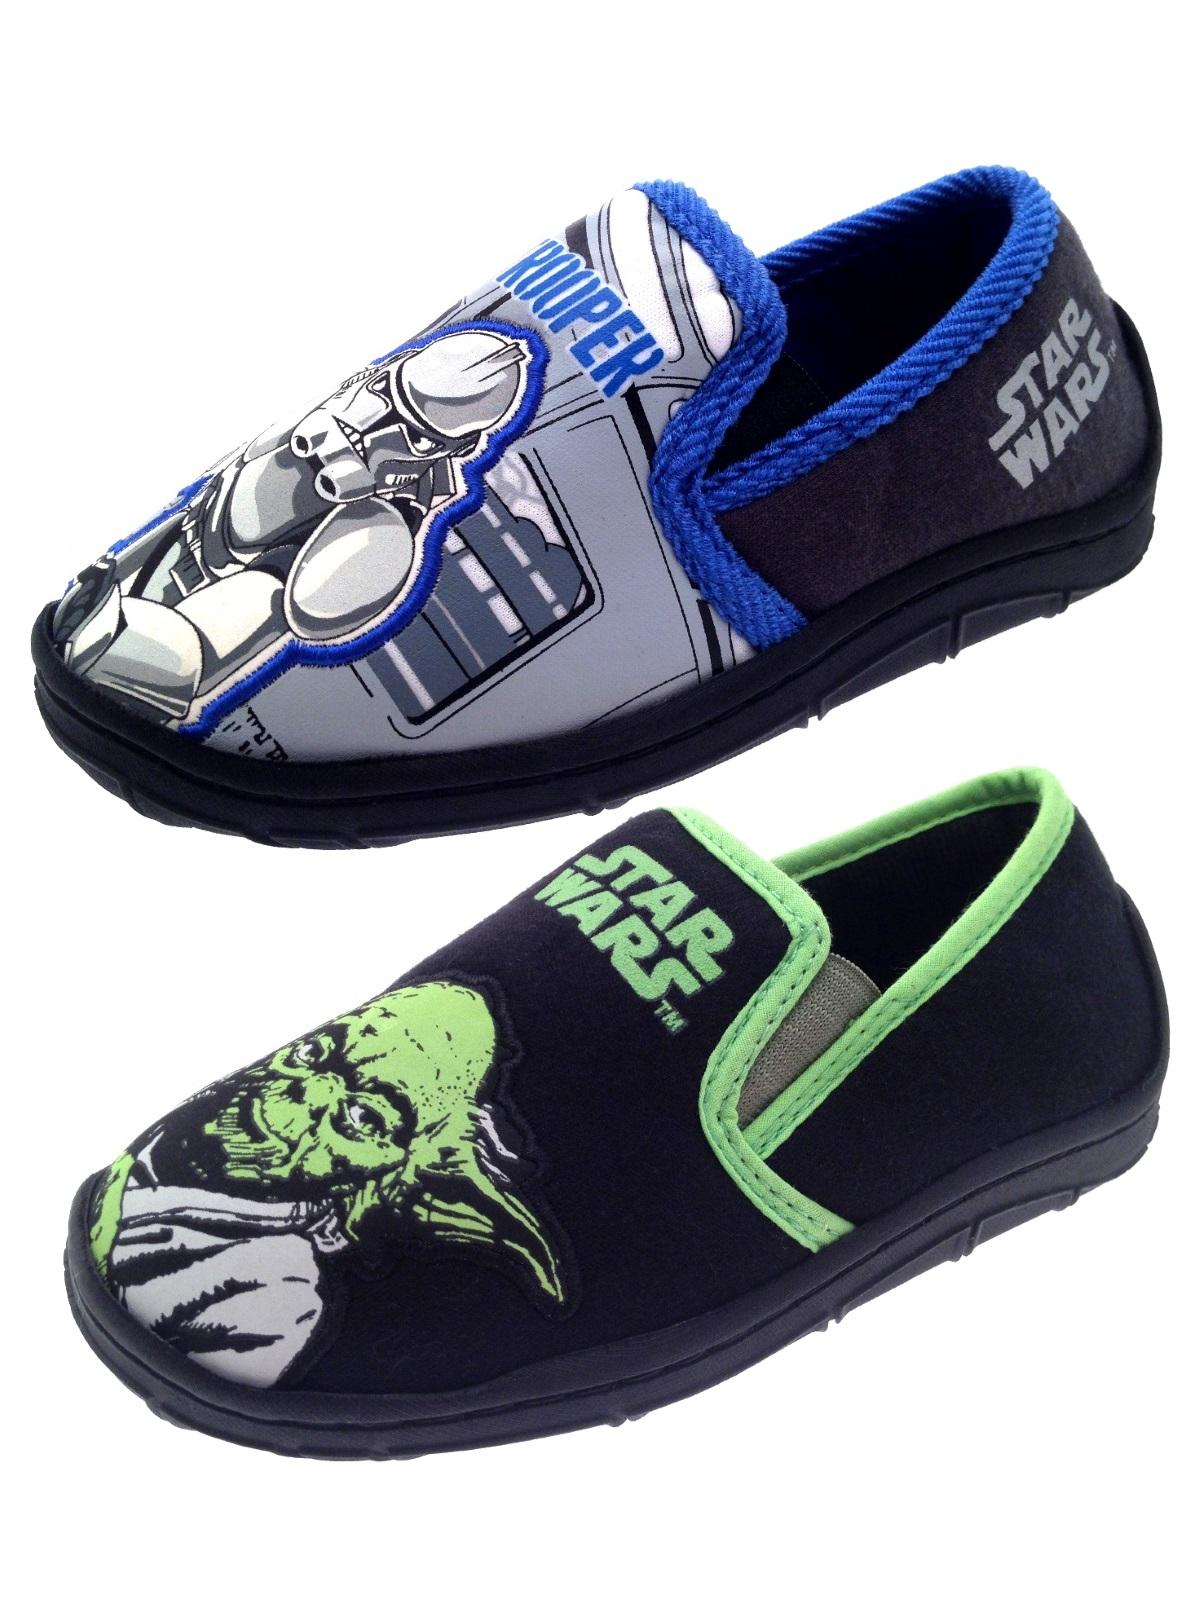 1de67744f82 Boys Disney Star Wars Slippers Slip On Novelty Character Mules Shoes ...